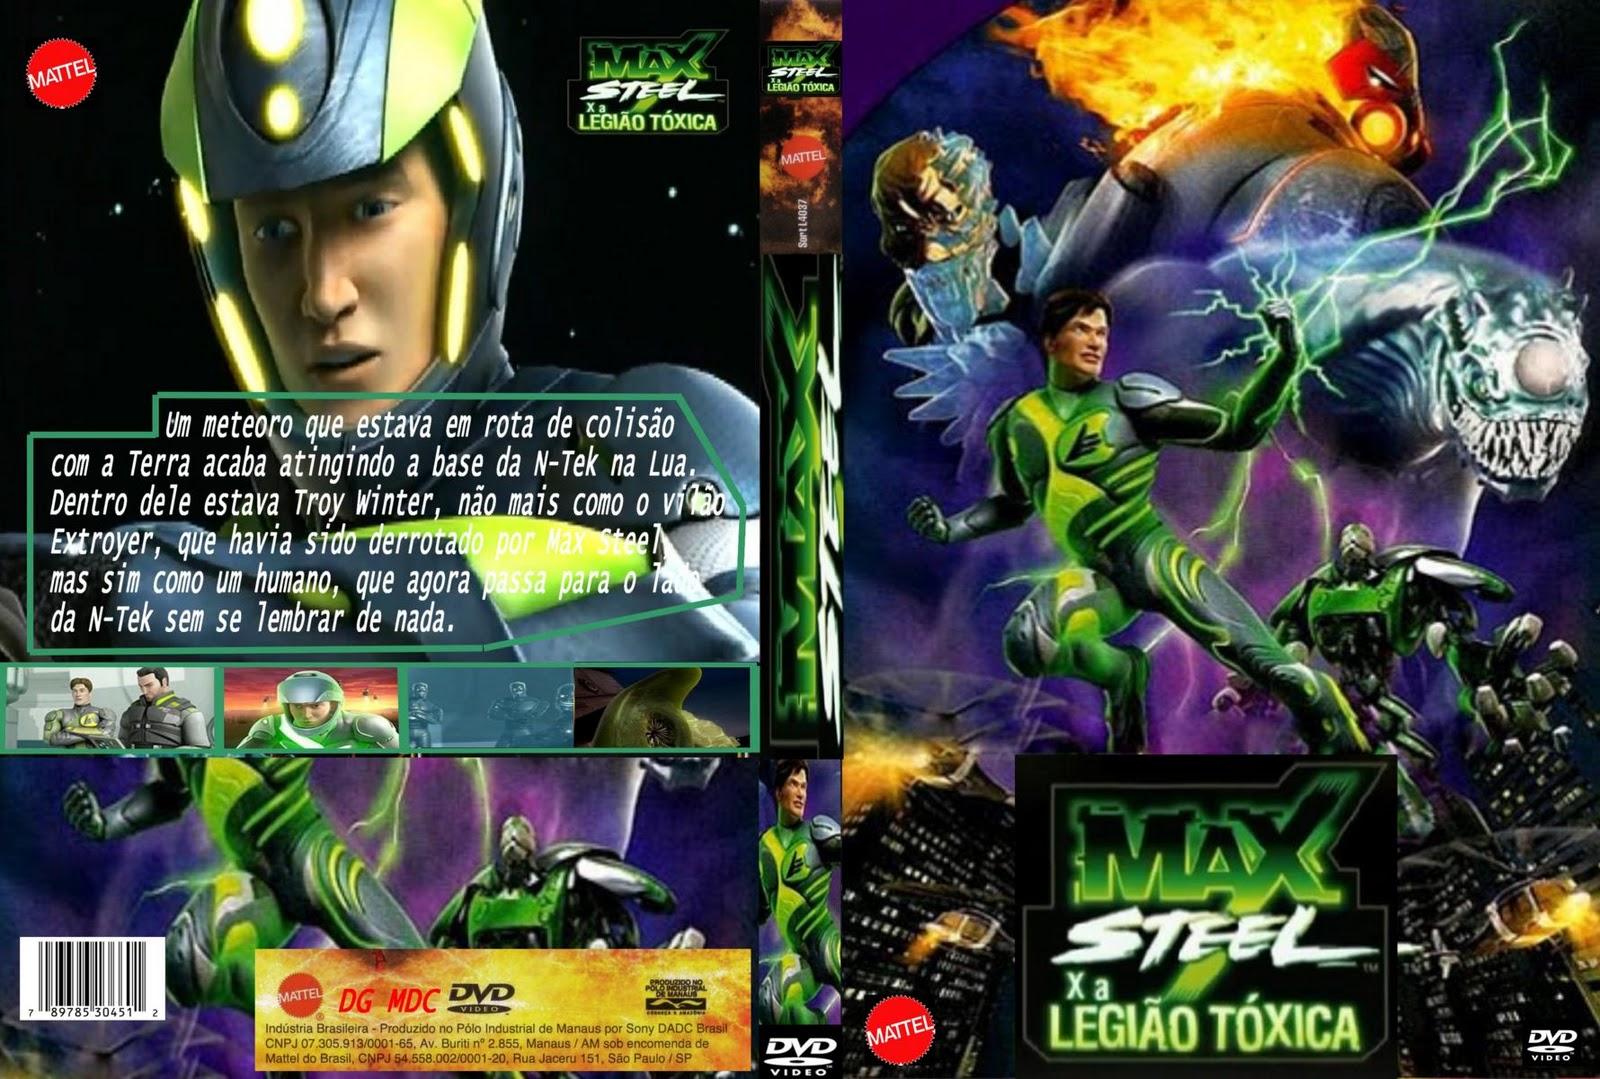 Max Steel X A Legi  O Toxica